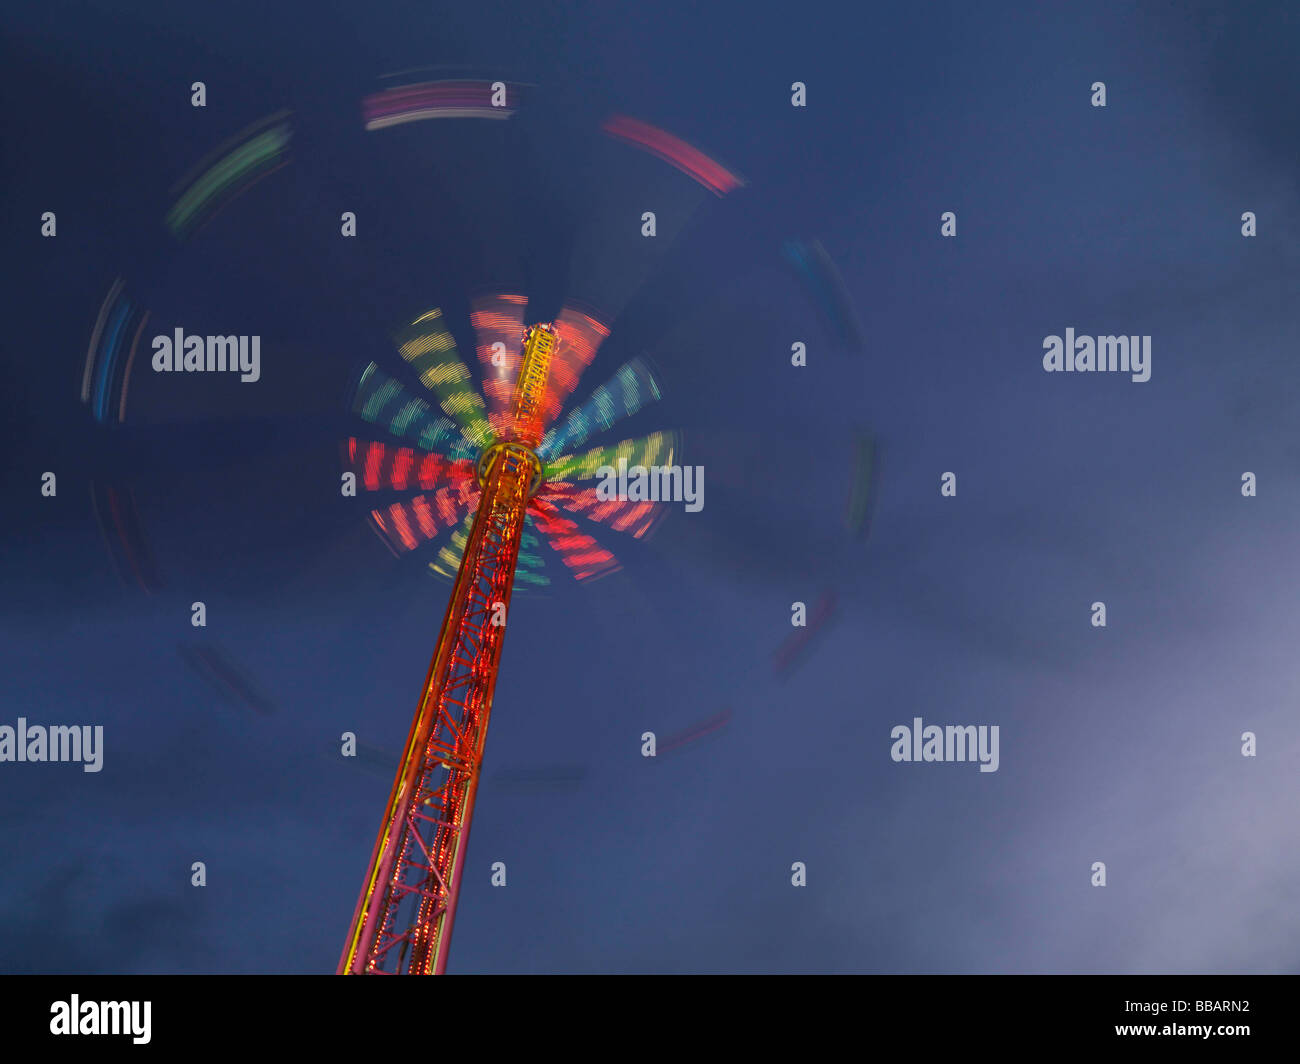 Illuminated chairoplane against dark sky - Stock Image